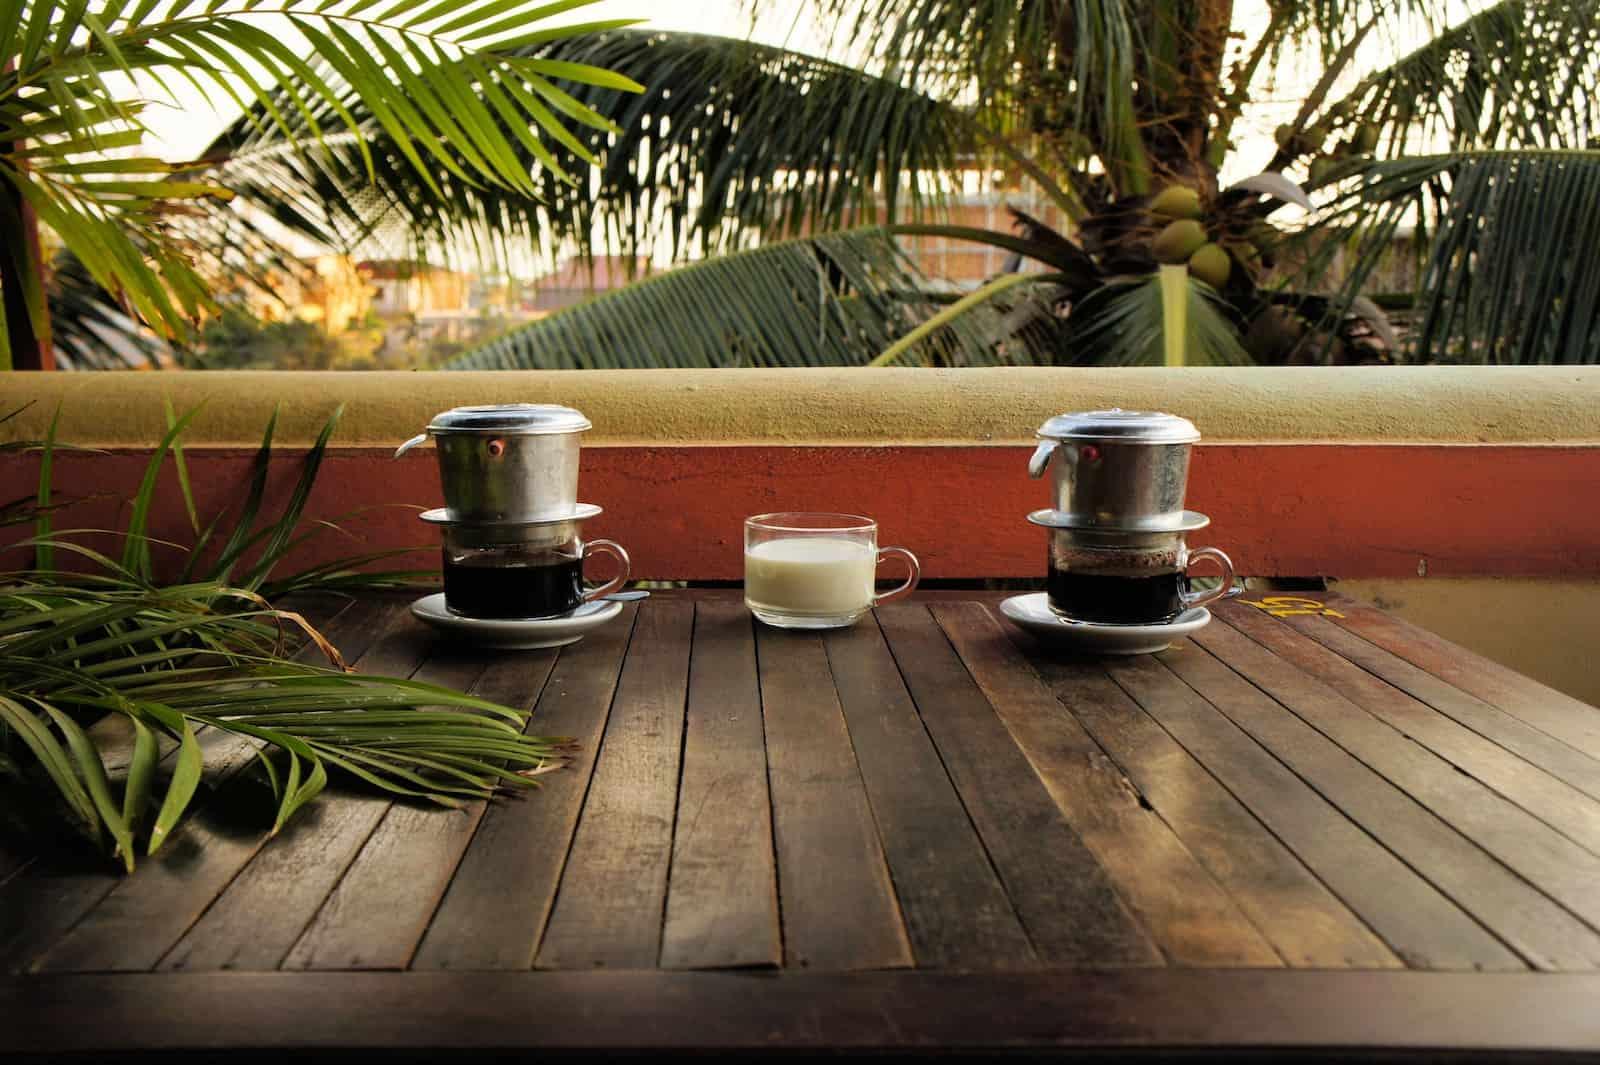 Vietnam Dripping Coffee with milk under palm trees